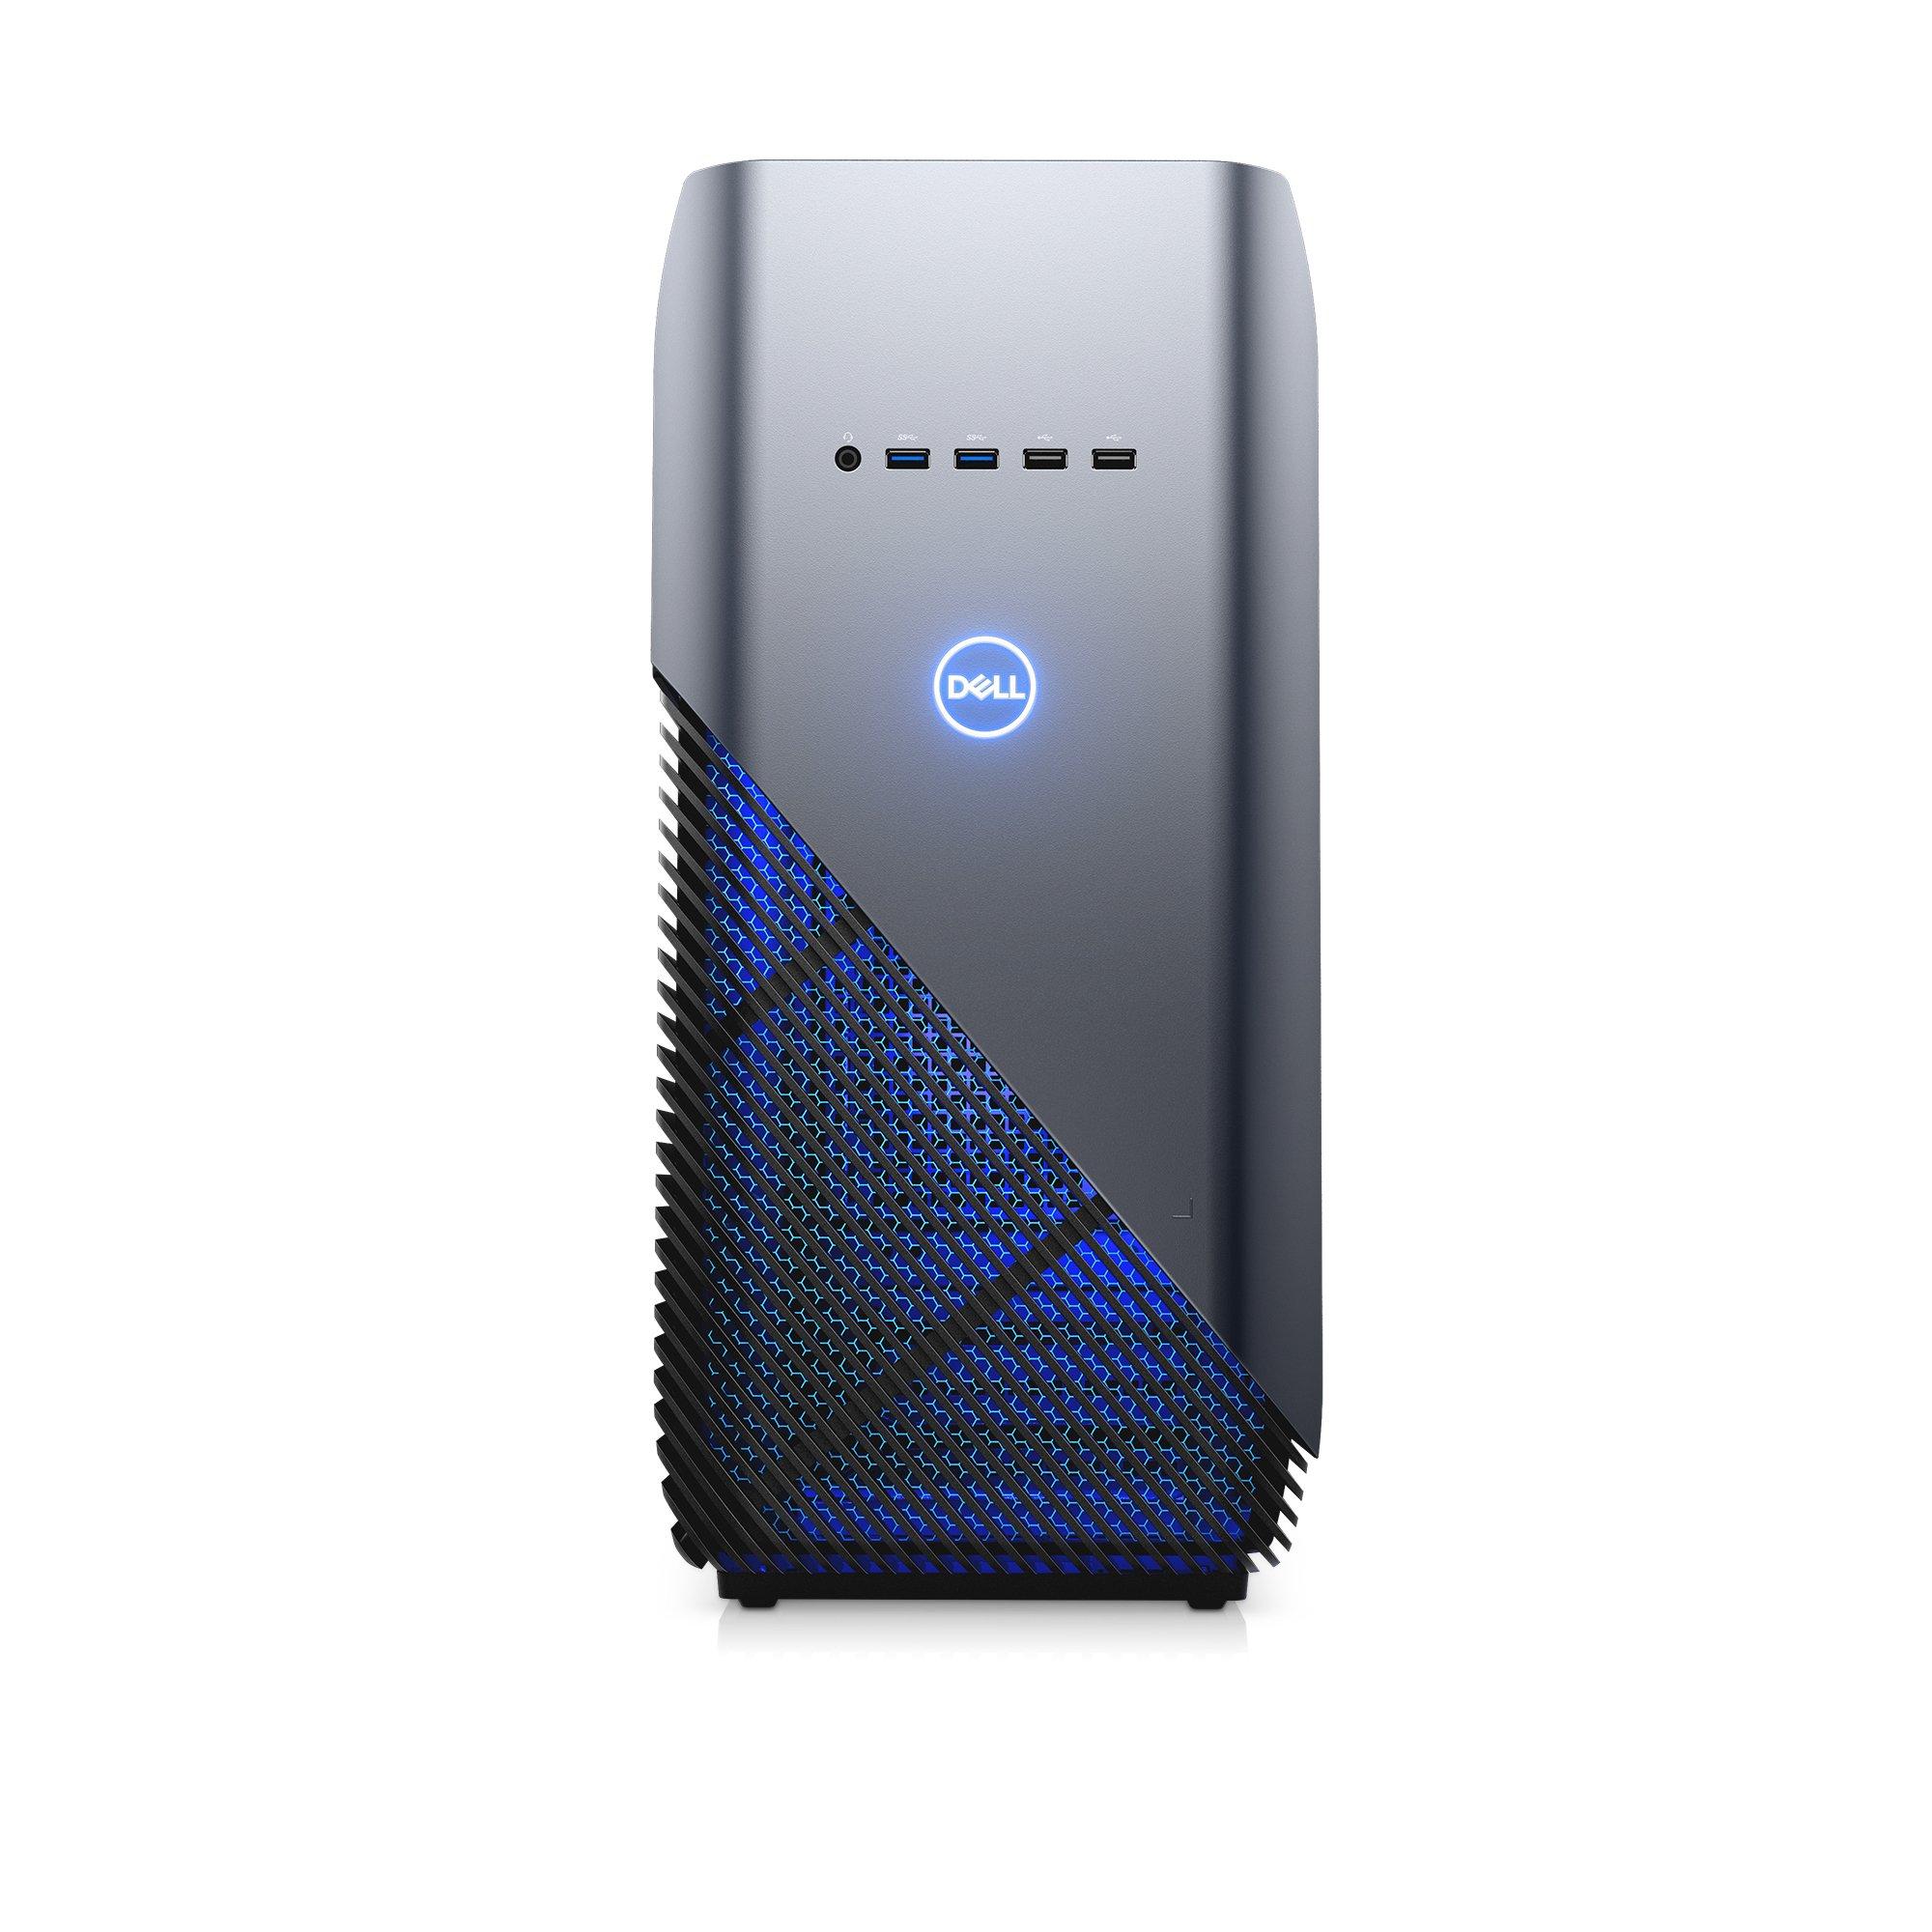 Dell i5680-7813BLU-PUS Inspiron Gaming PC Desktop 5680, Intel Core i7-8700, 16GB DDR4 Memory, 128GB SSD+2TB SATA HDD, NVIDIA GeForce GTX 1060, Recon Blue, Windows 10 64-bit by Dell